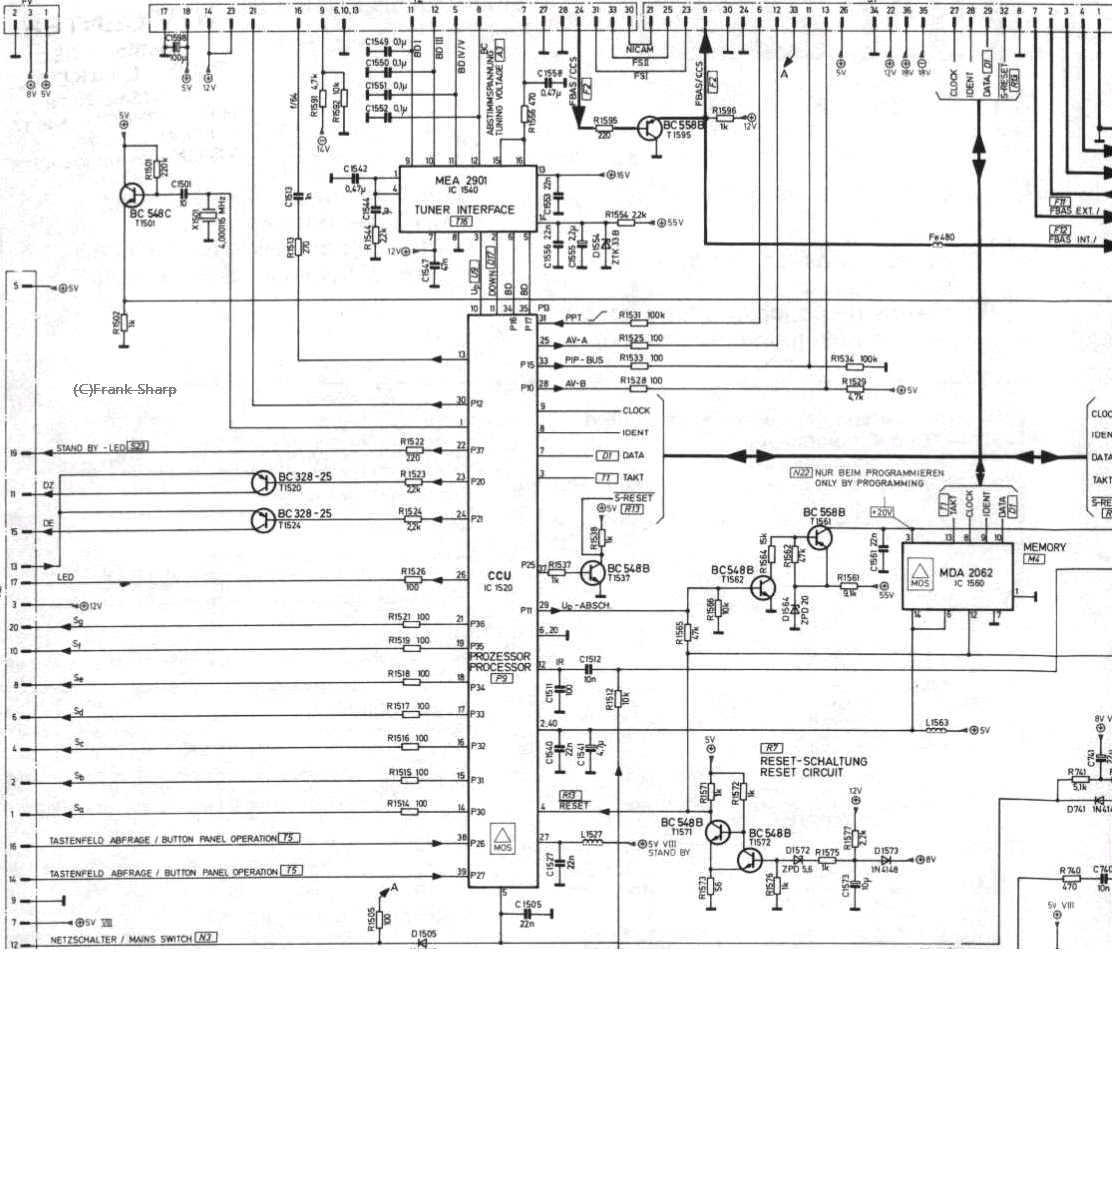 hight resolution of edenpure model 500 wiring diagram heat map diagram wiring edenpure heater model 1000 edenpure heater on sale